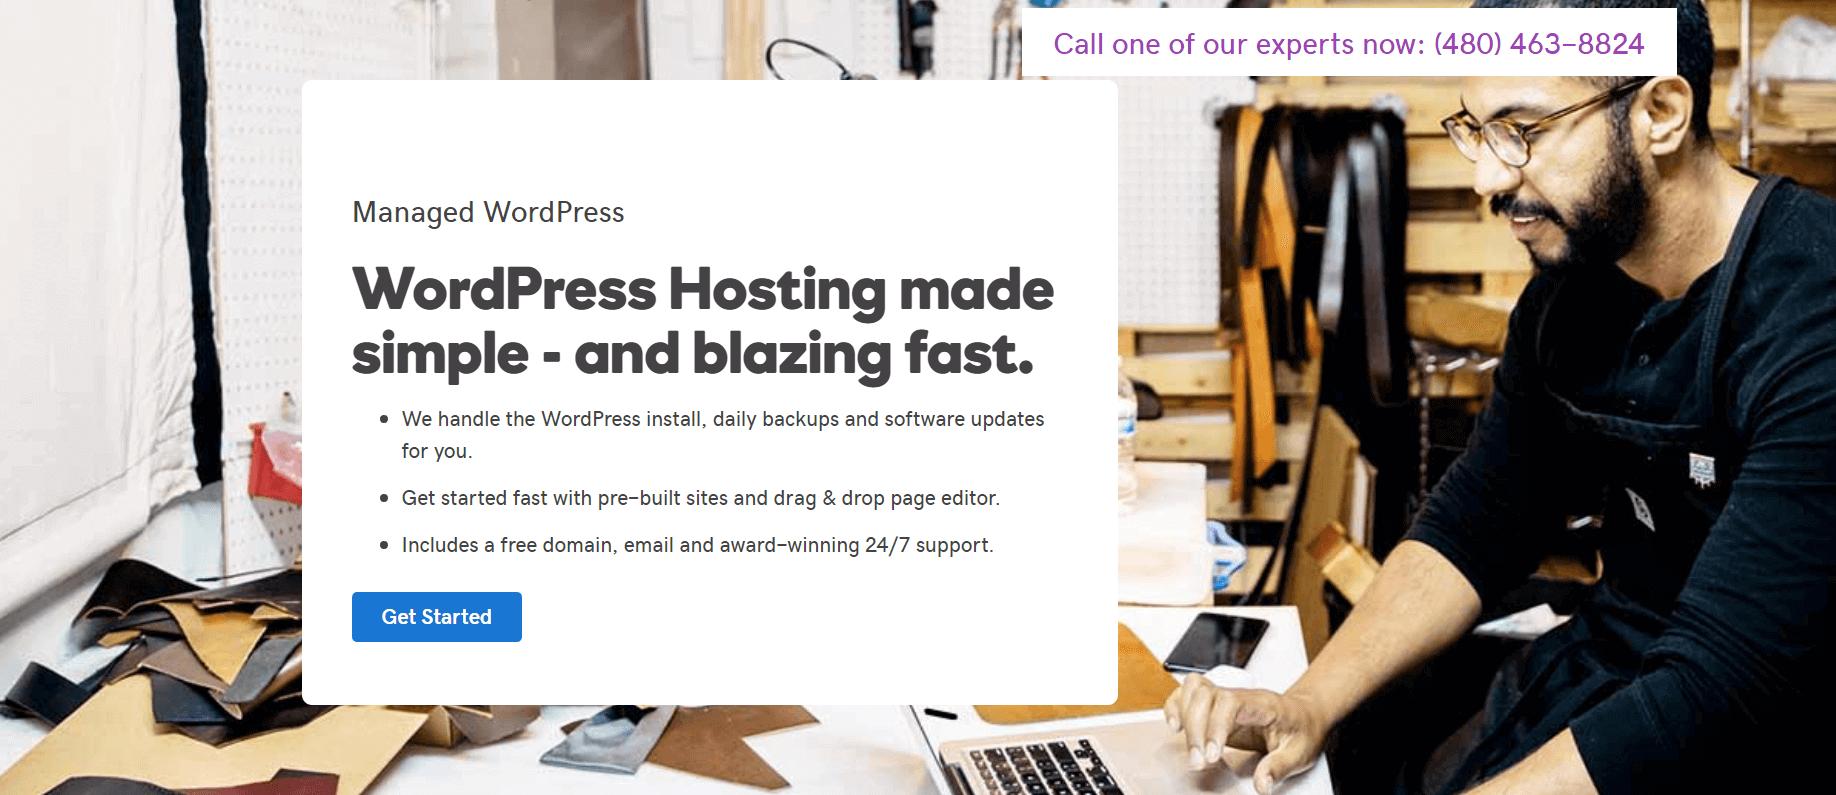 GoDaddy's WordPress hosting.